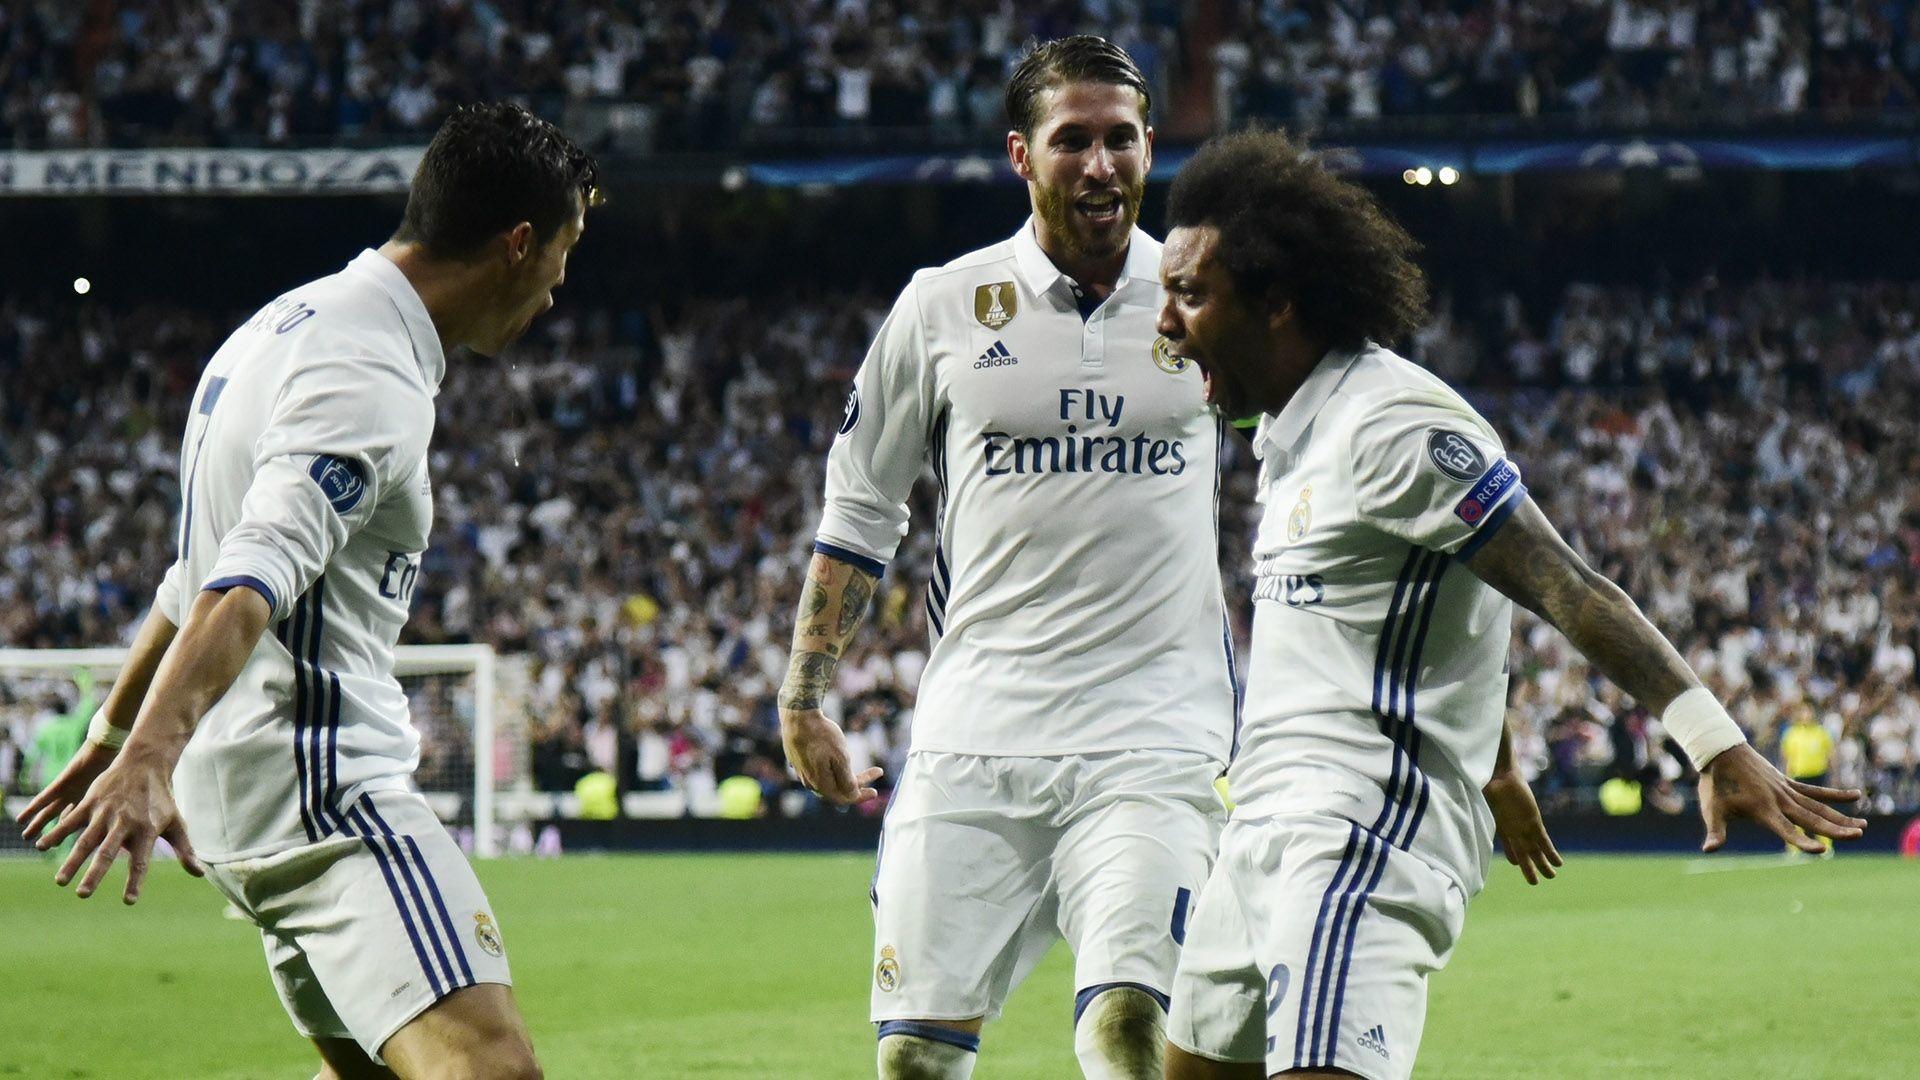 1920x1080 Wallpaper Keren Real Madrid 2017 2018 Wallpaper6